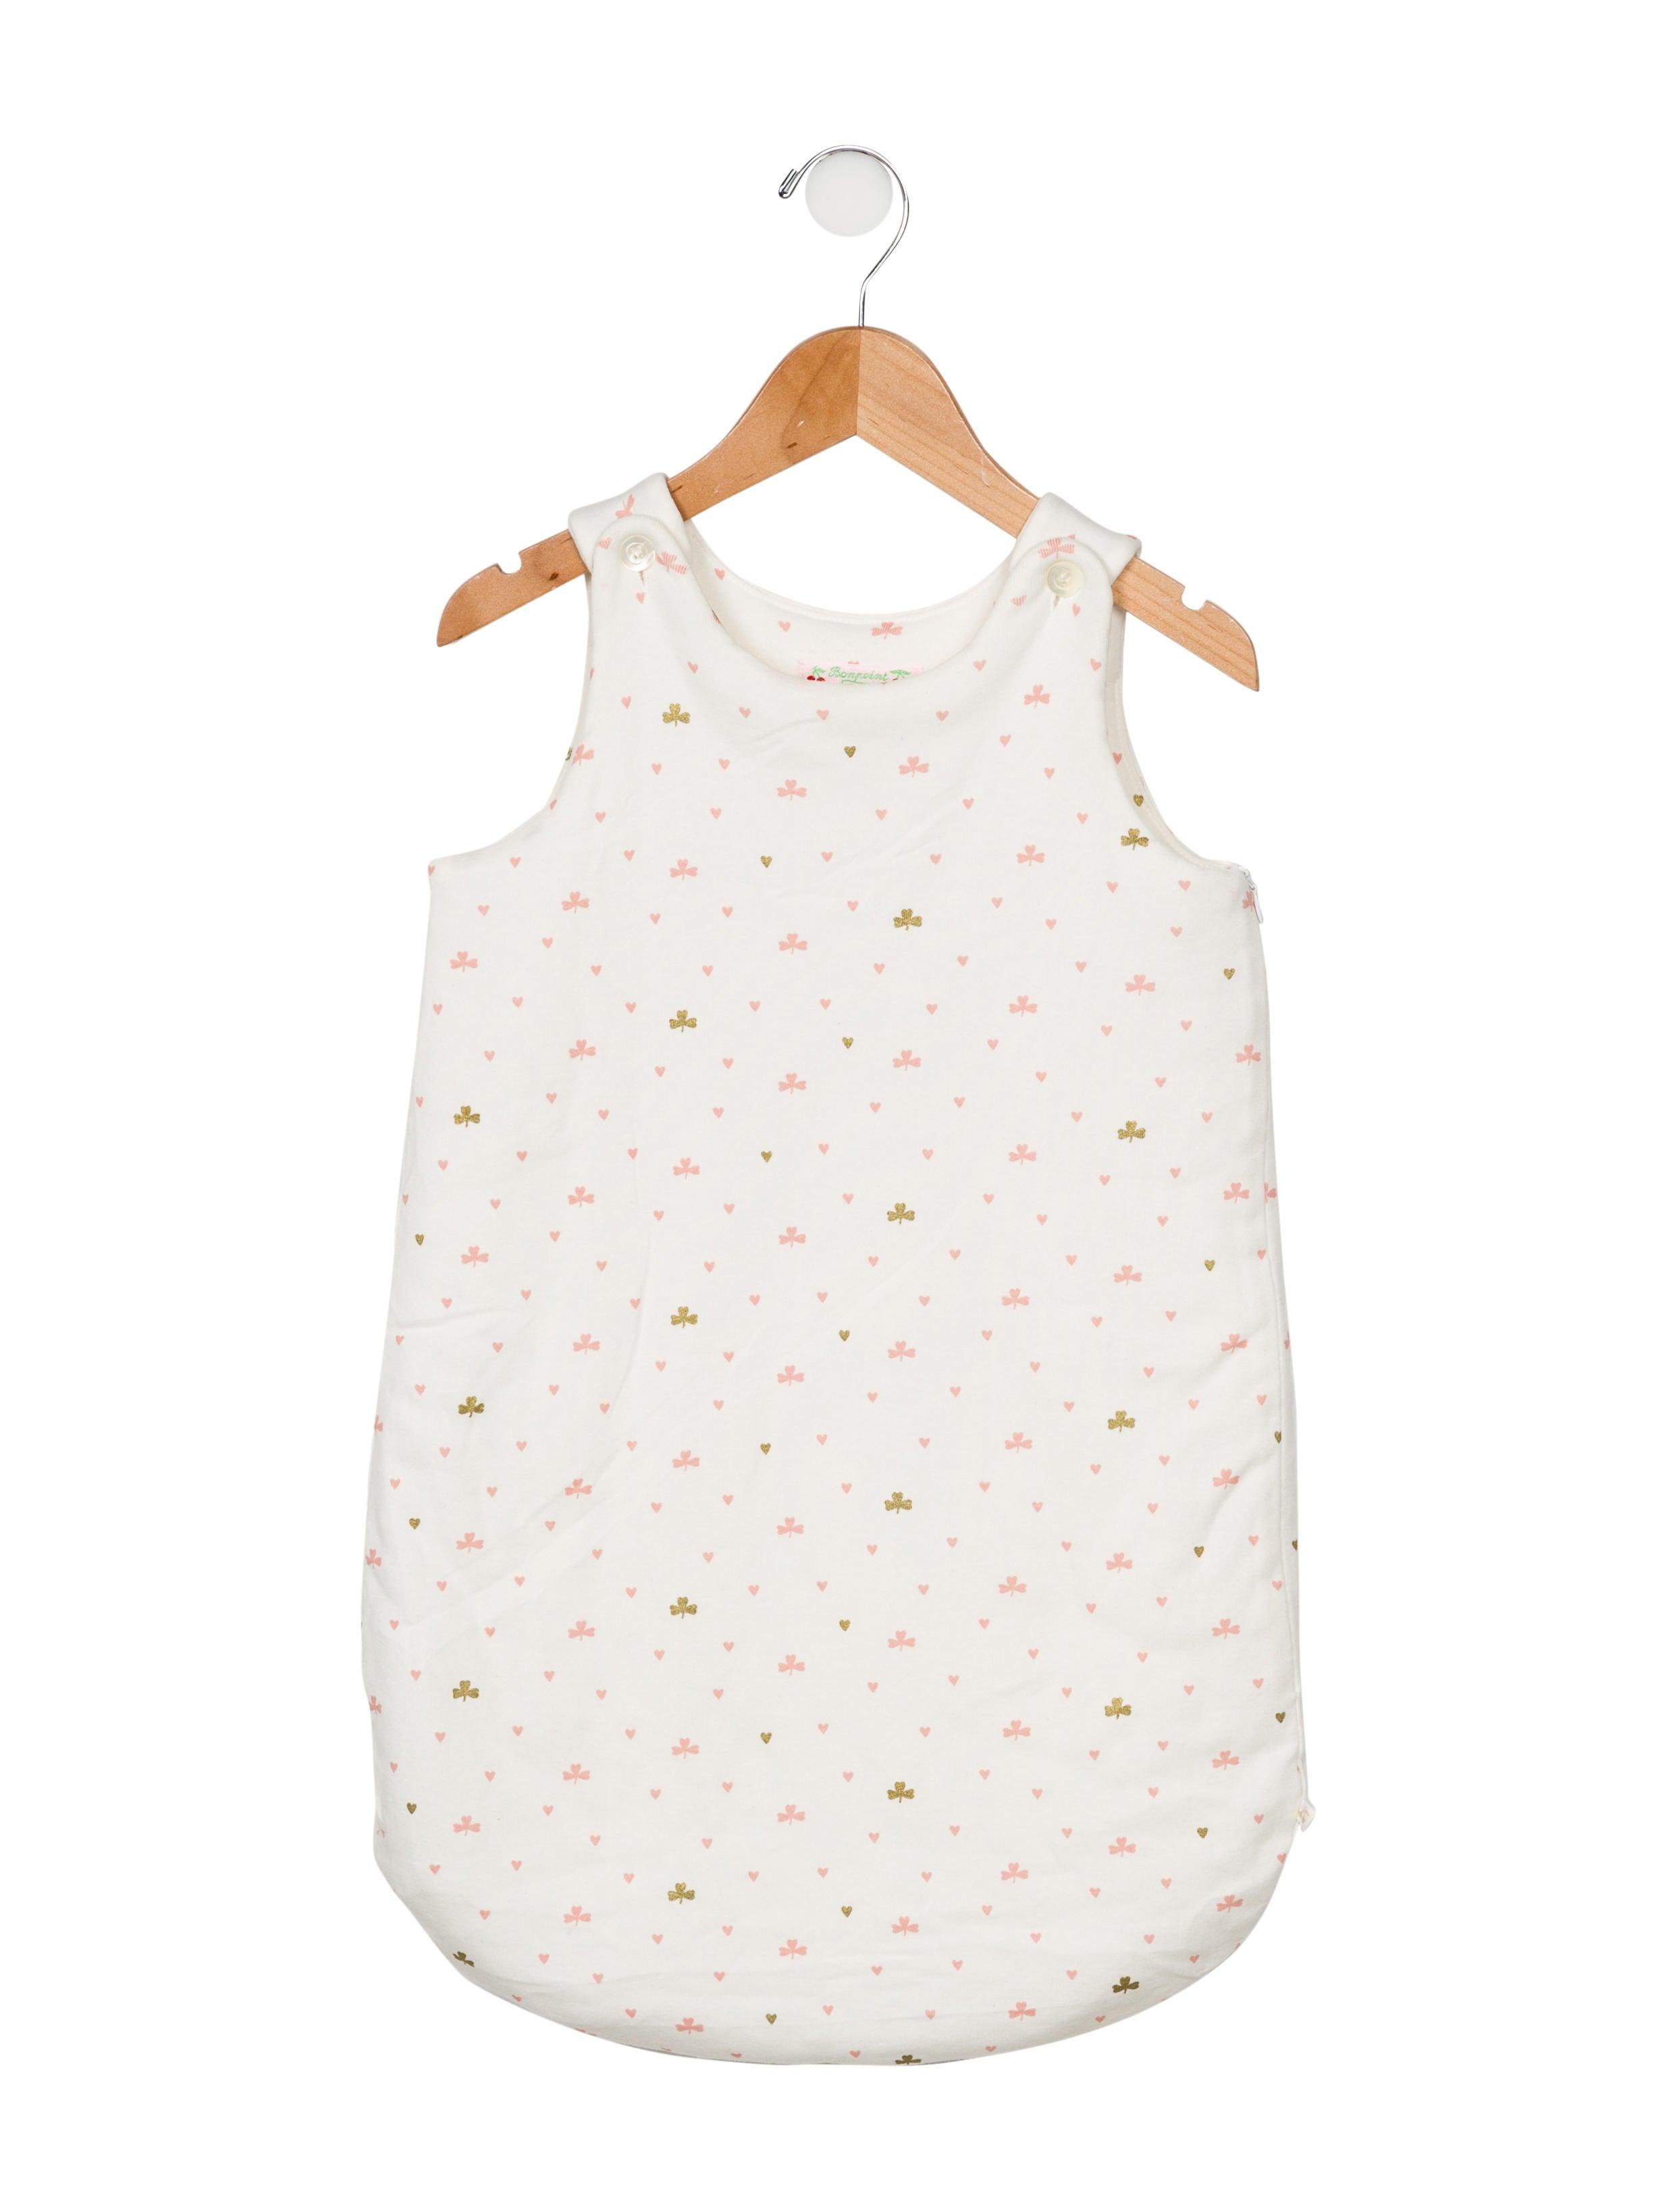 new style 4b341 c789a Girls' Printed Knit Sleep Sack